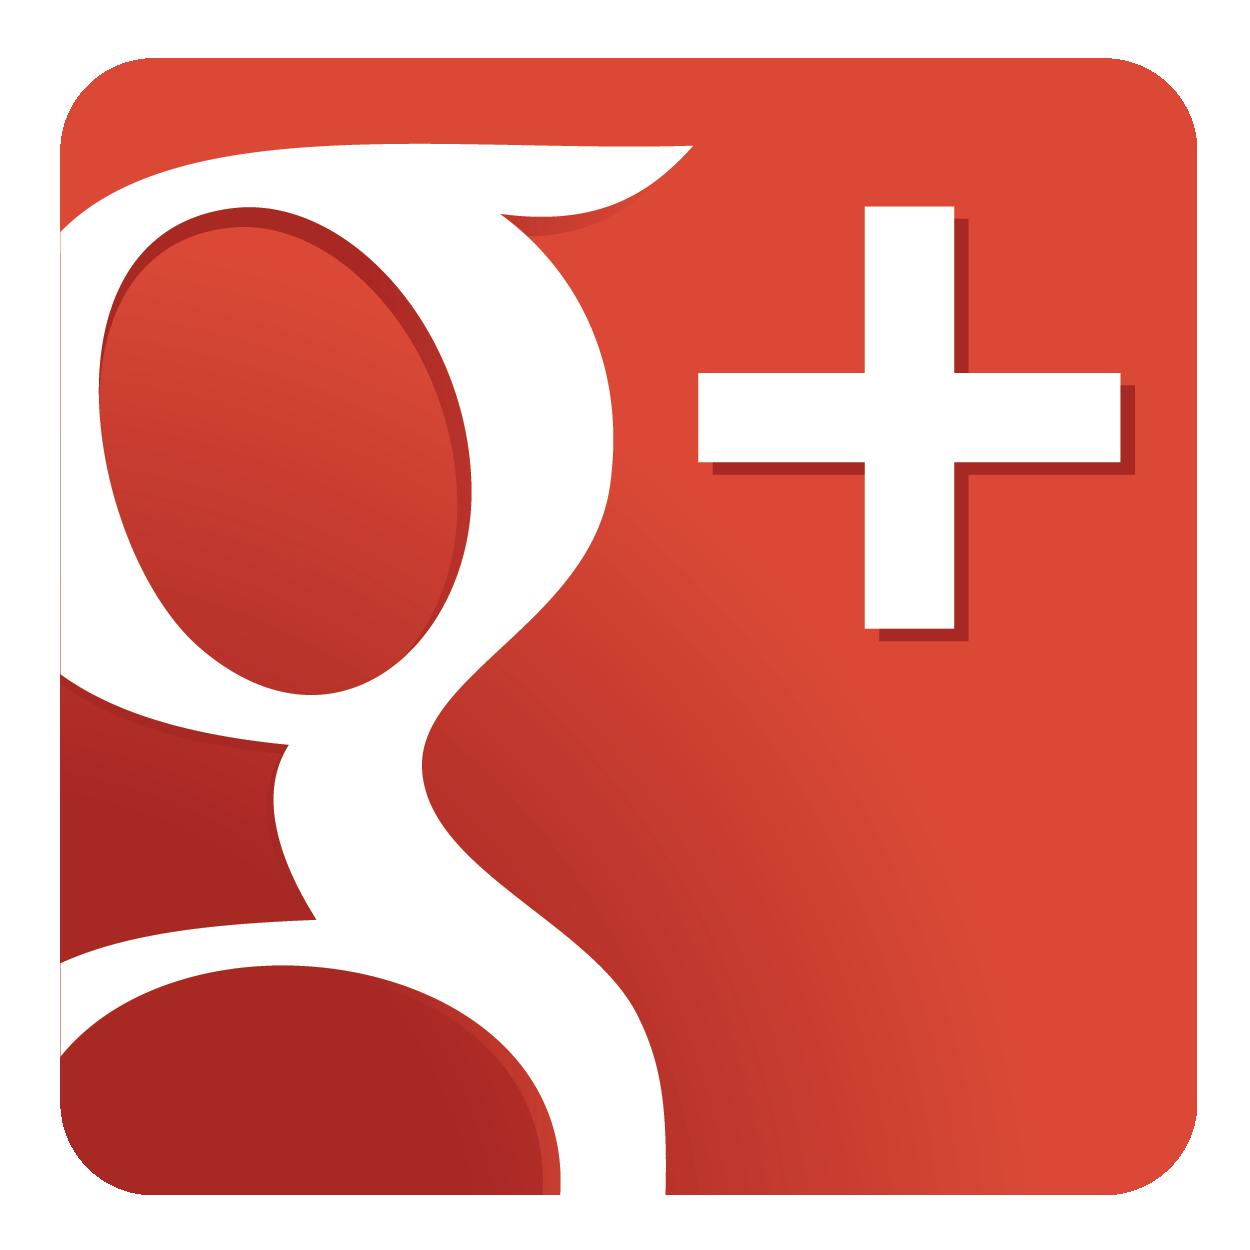 google plus square social logo png